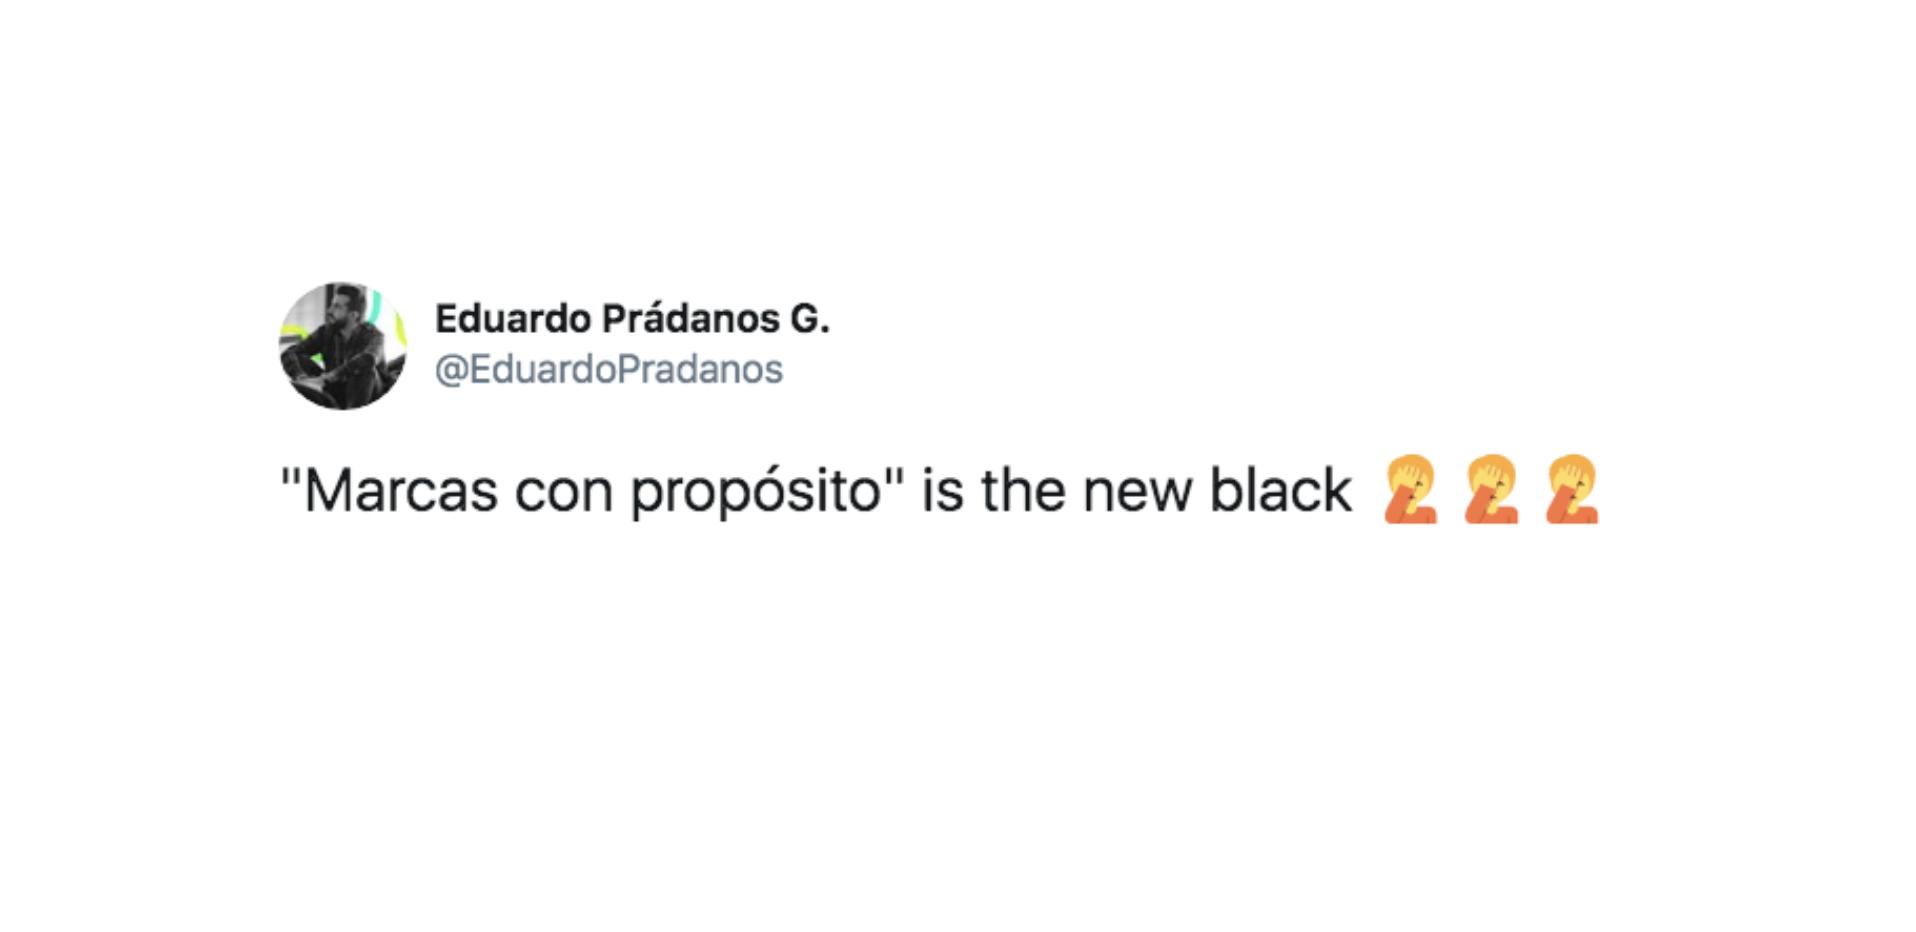 201111_eduardo-pradanos_marcas-con-proposito-is-the-new-black